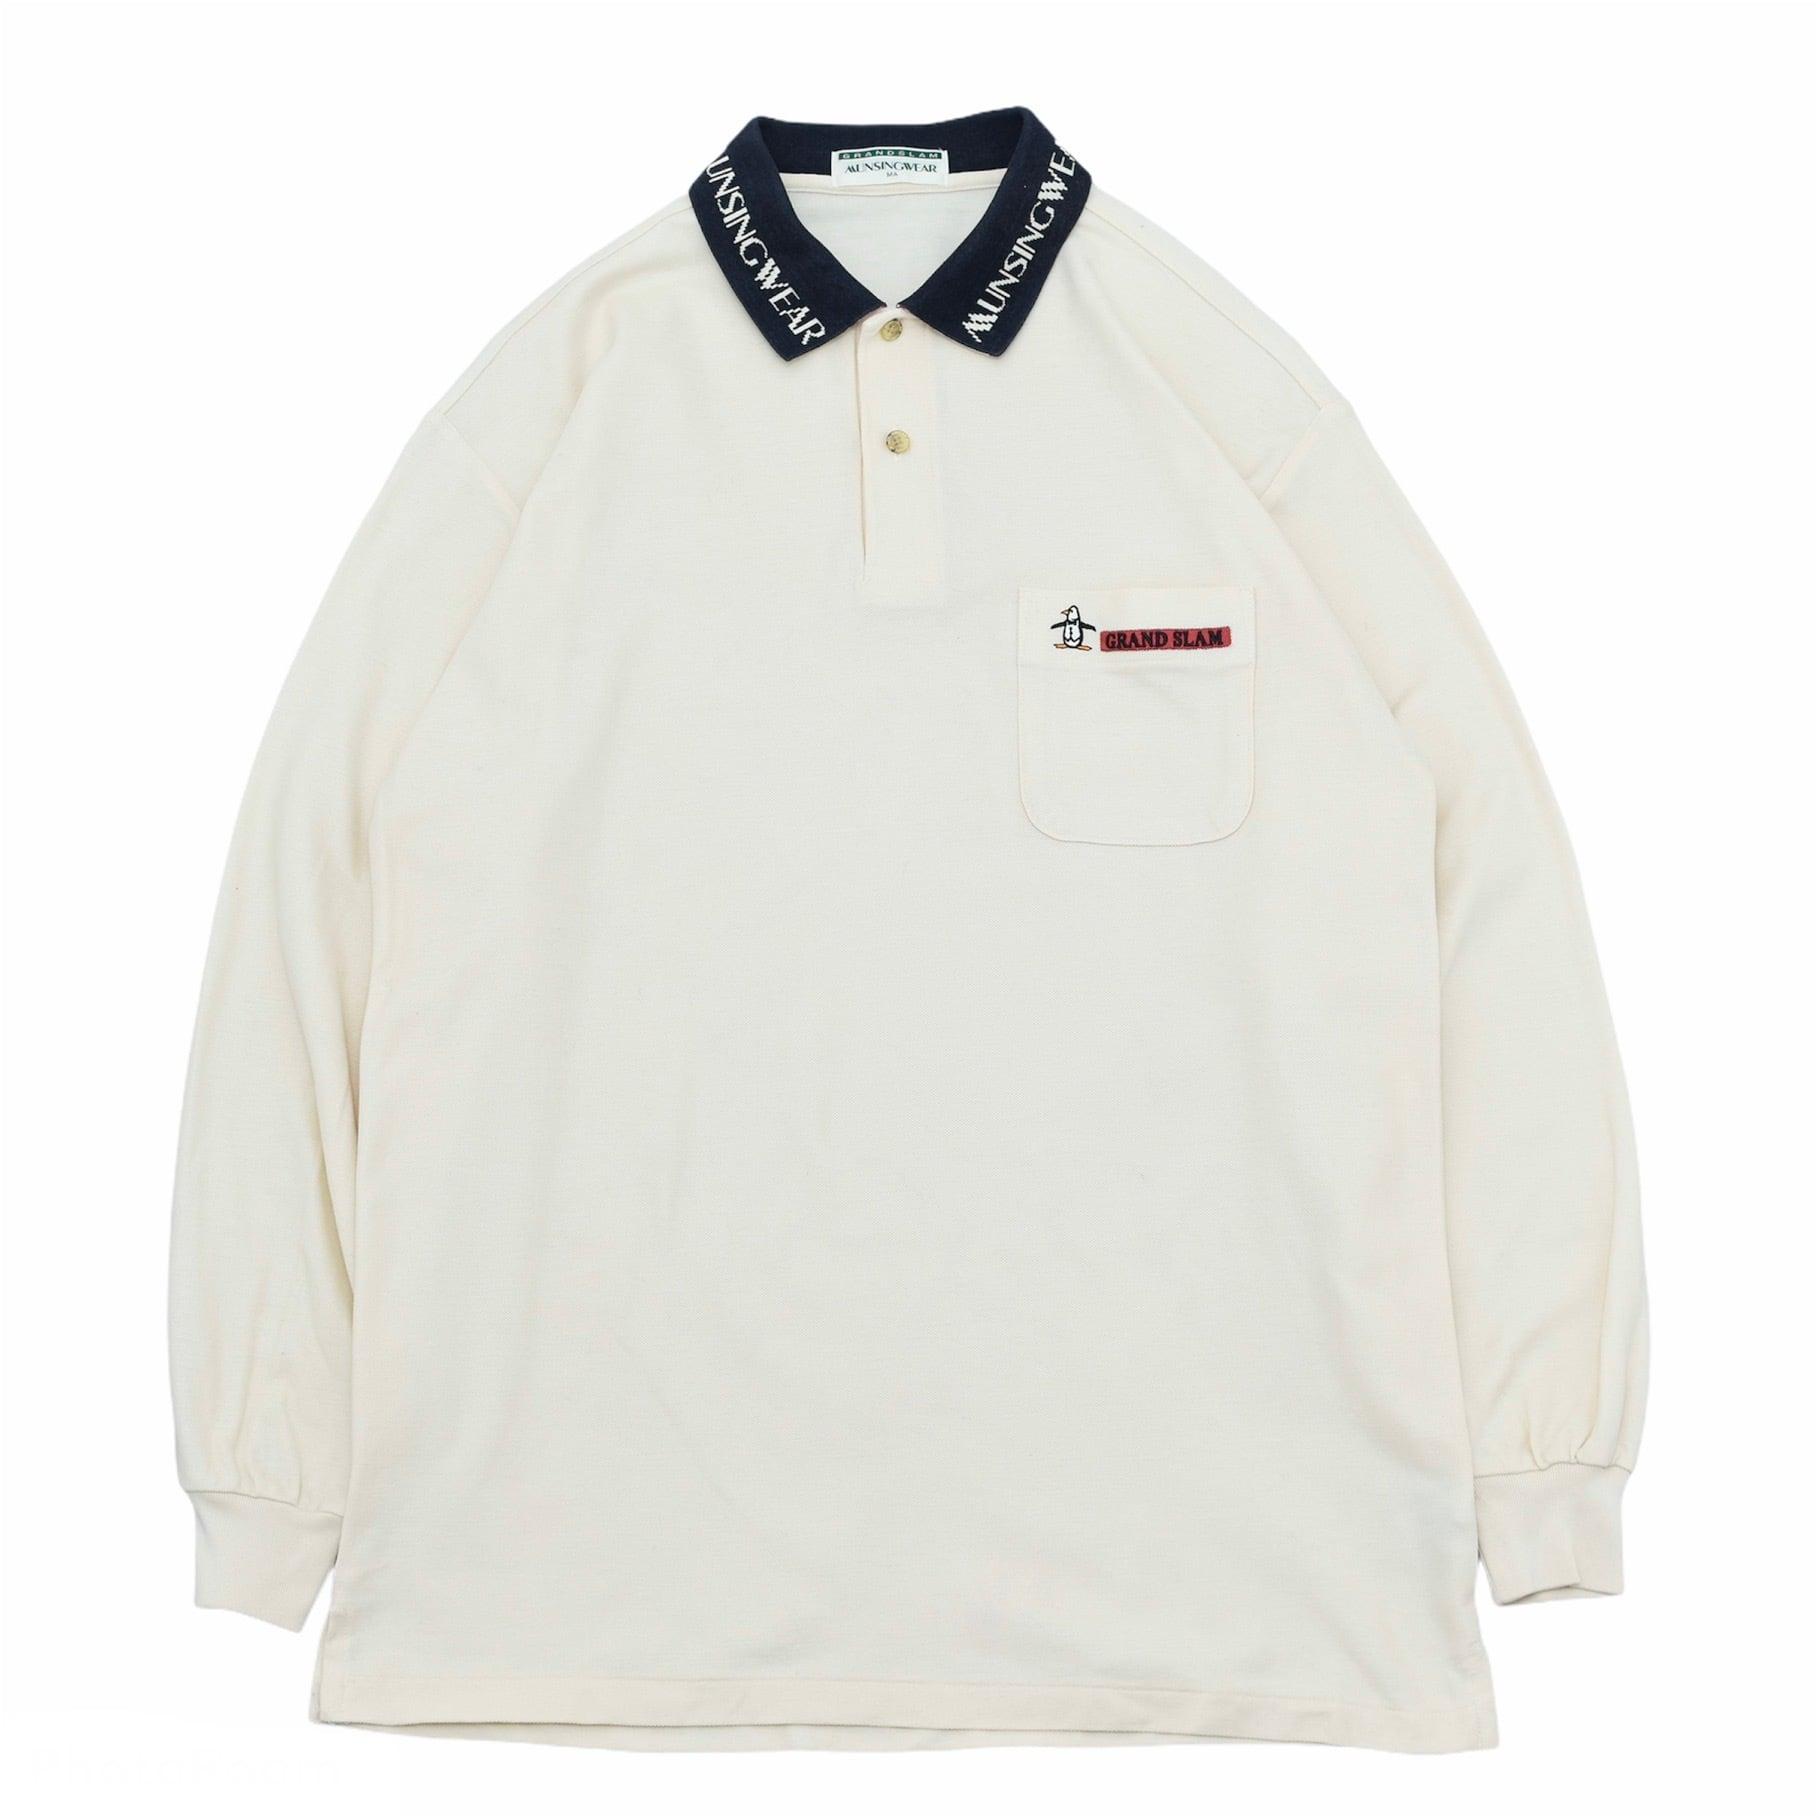 MUNSINGWEAR one point logo polo shirt